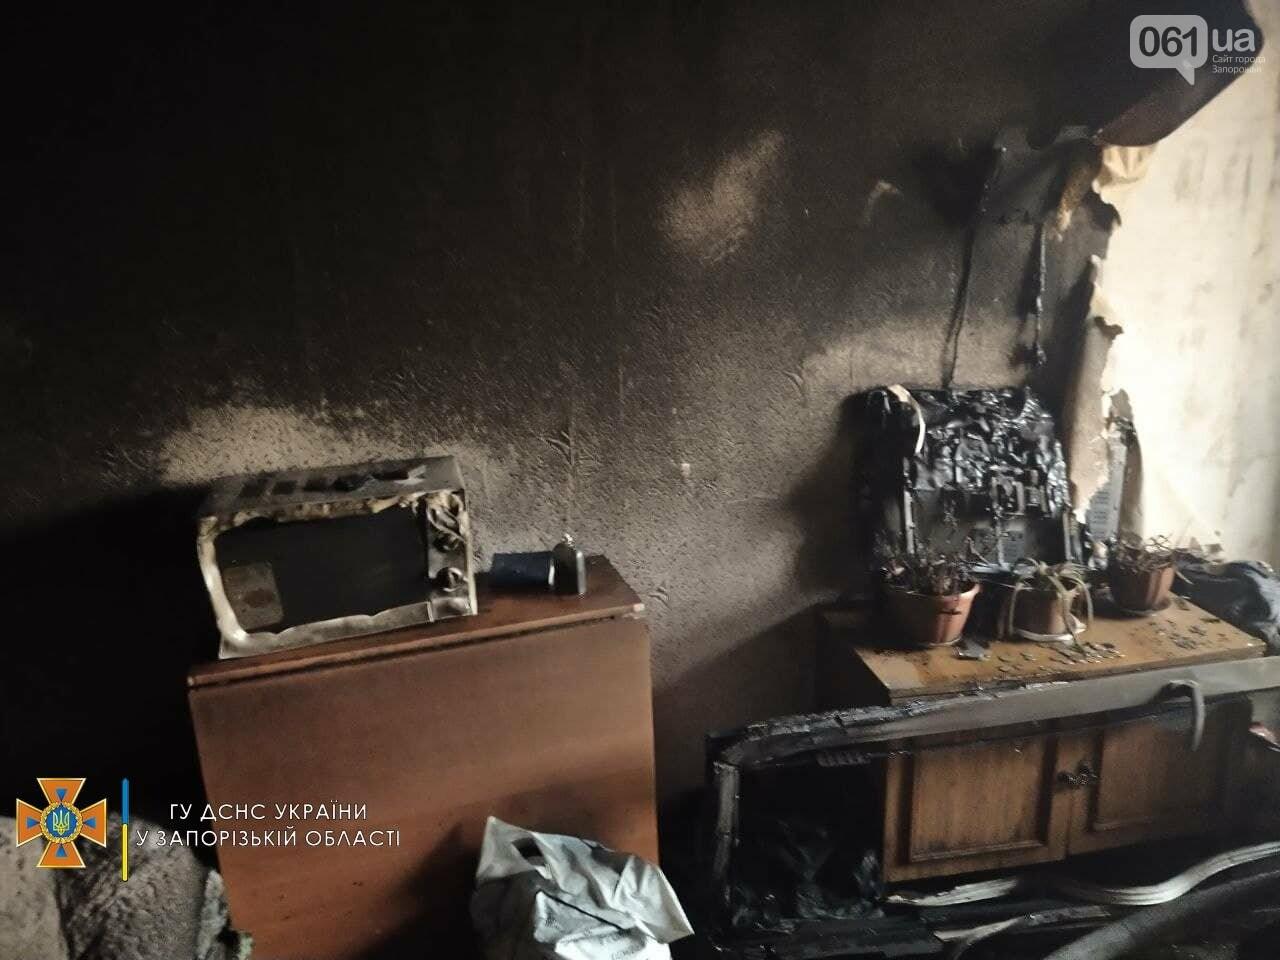 photo2021 09 1210 14 31result 613dd238c8f37 - В Запорожье 18 спасателей тушили пожар в девятиэтажке, - ФОТО